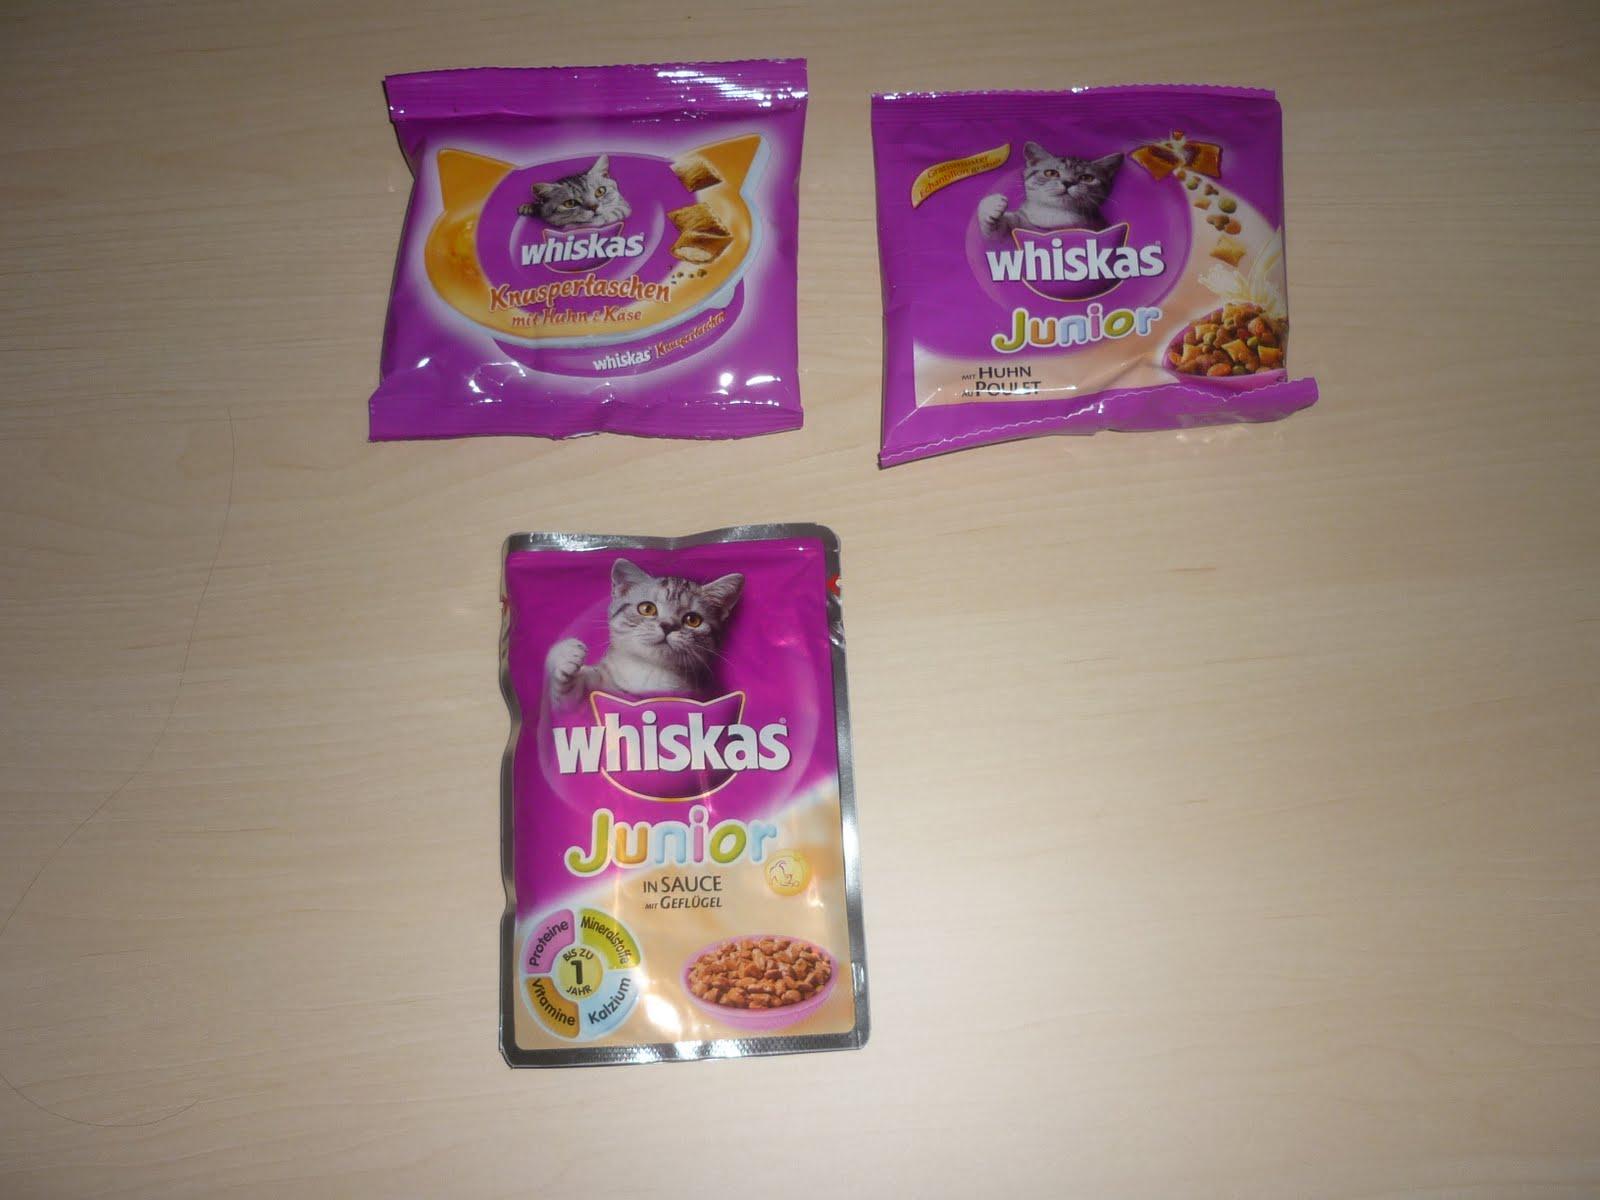 whiskas knuspertaschen coupon